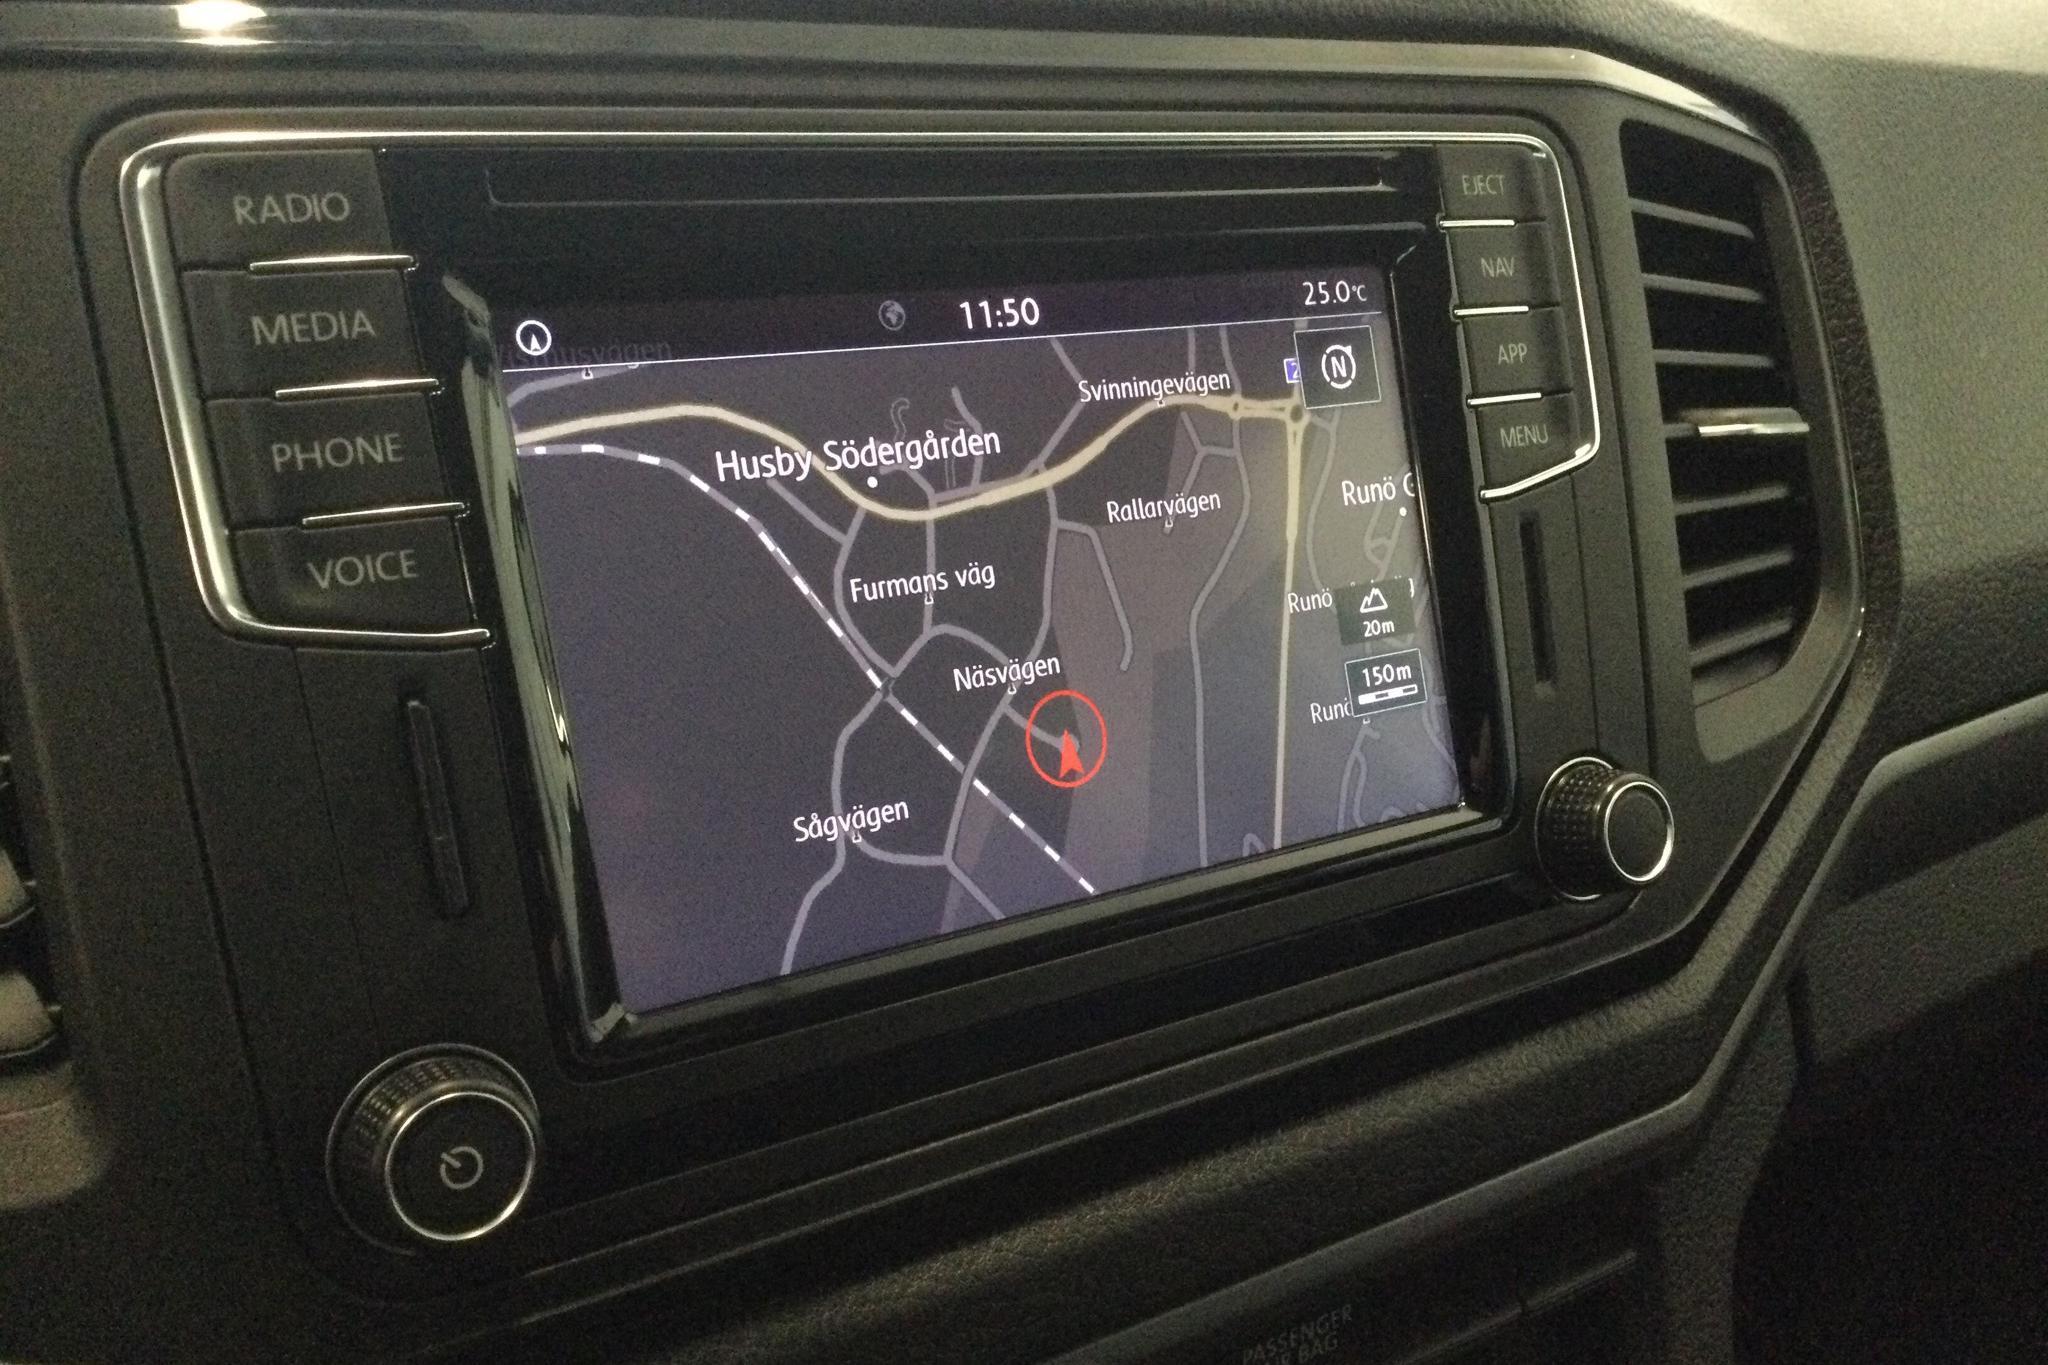 VW Amarok 3.0 TDI 4motion (204hk) - 5 824 mil - Automat - vit - 2019